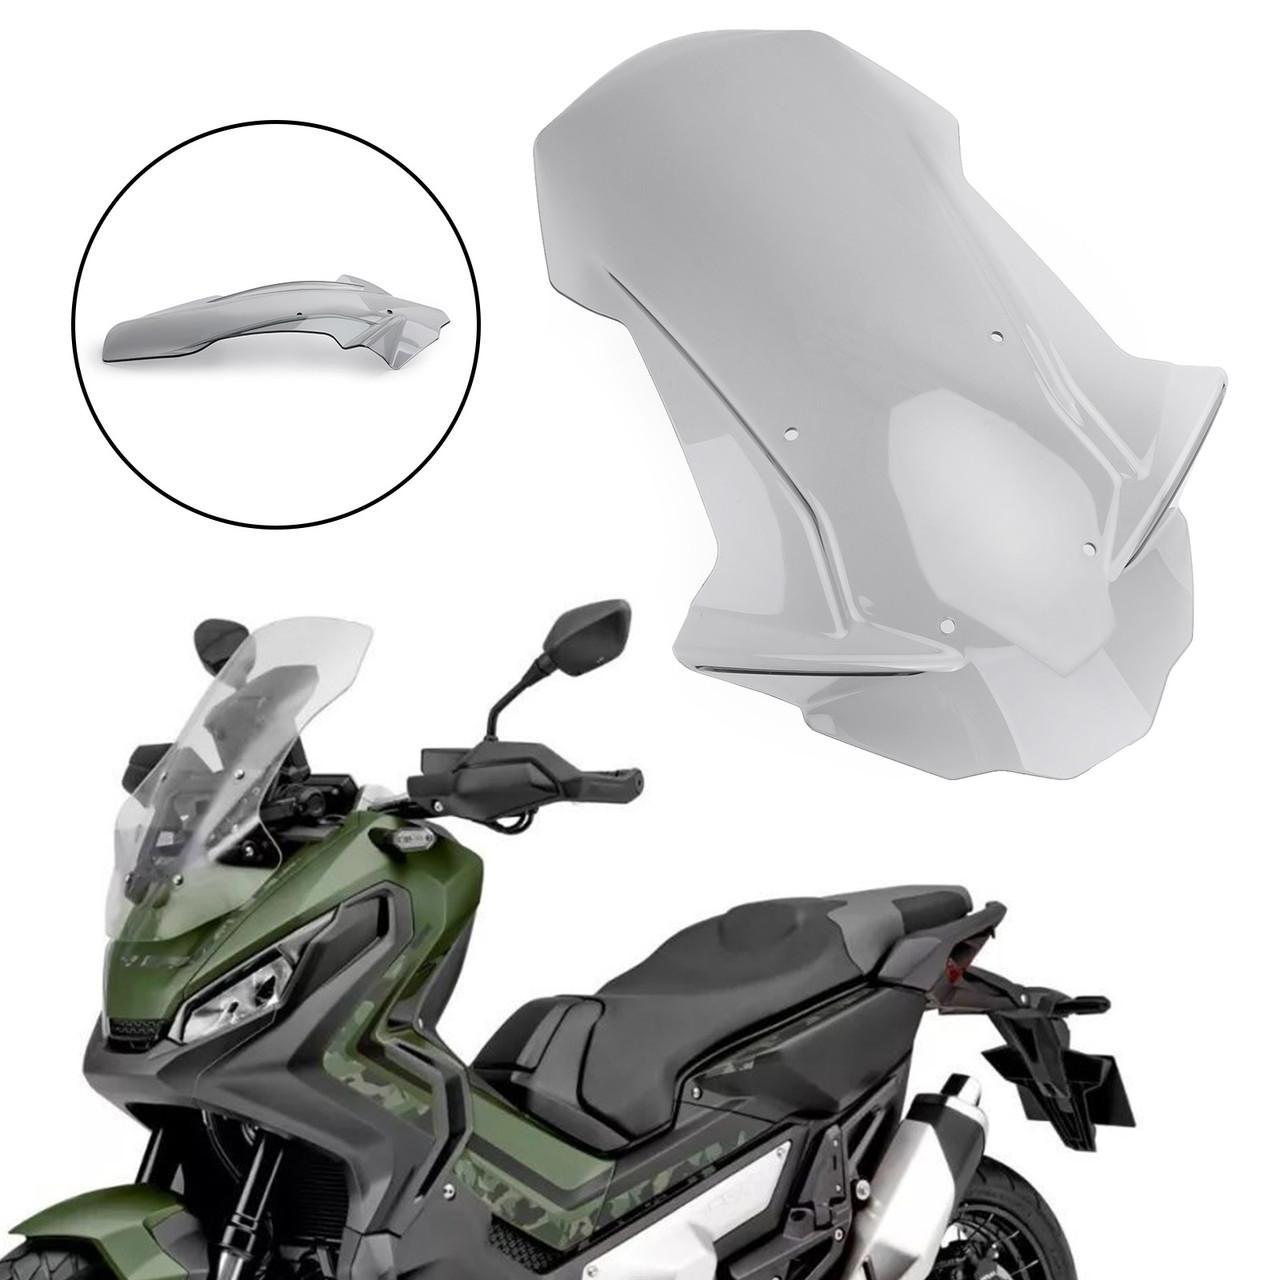 ABS Plastic Motorcycle Windshield Windscreen For Honda X-ADV 750 2017-2019  Grey